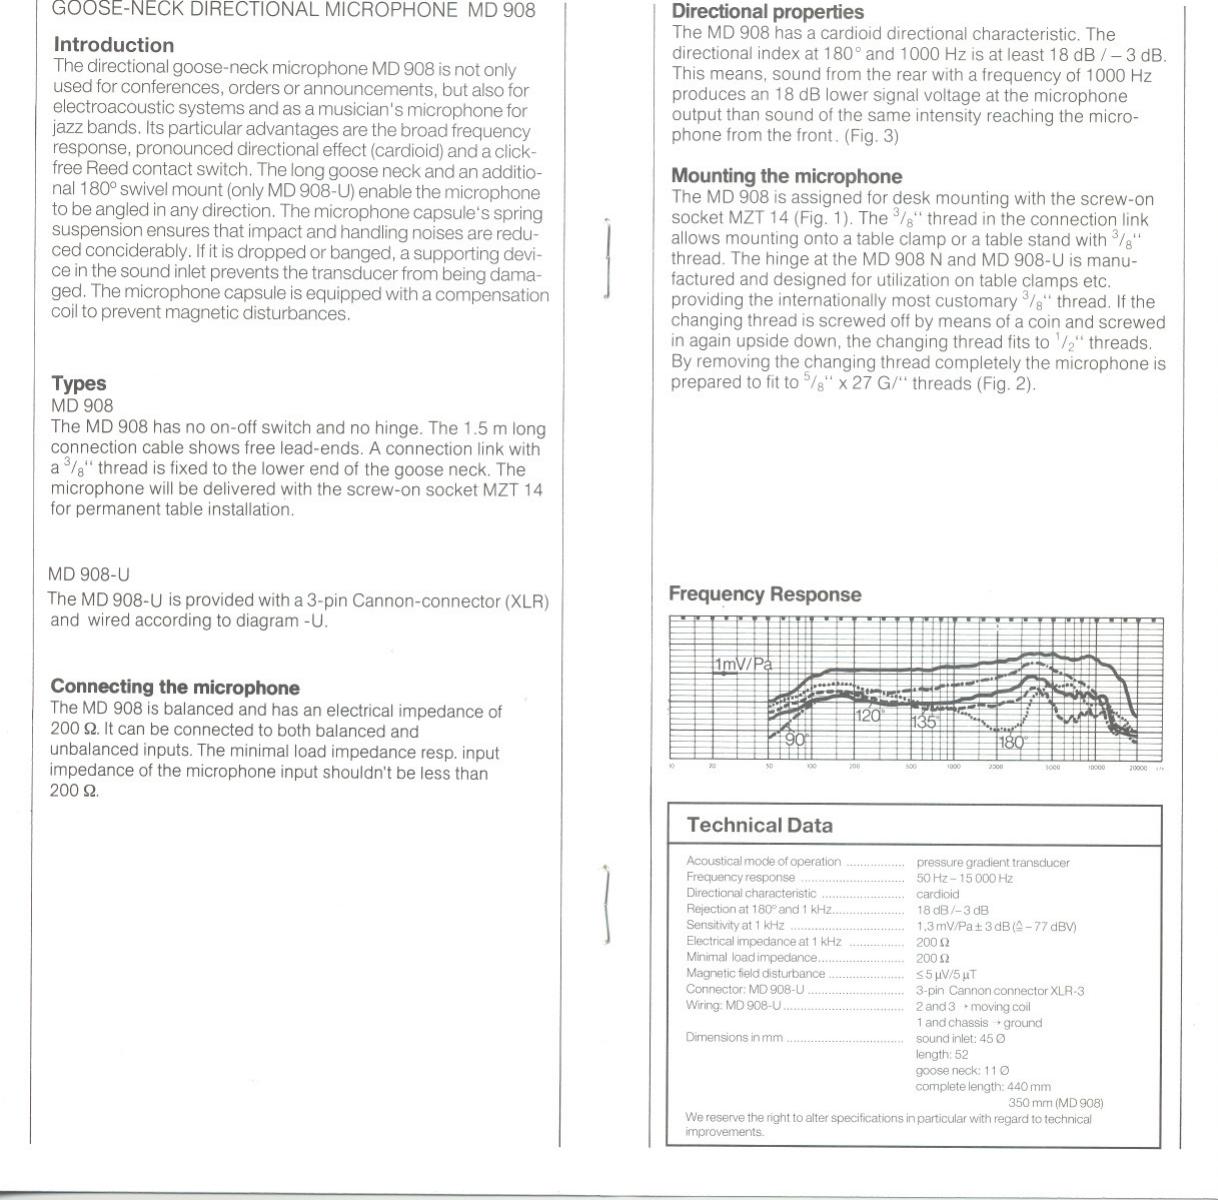 Sennheiser Md 908 Users Manual Microphone Wiring Diagram Page 4 Of 6